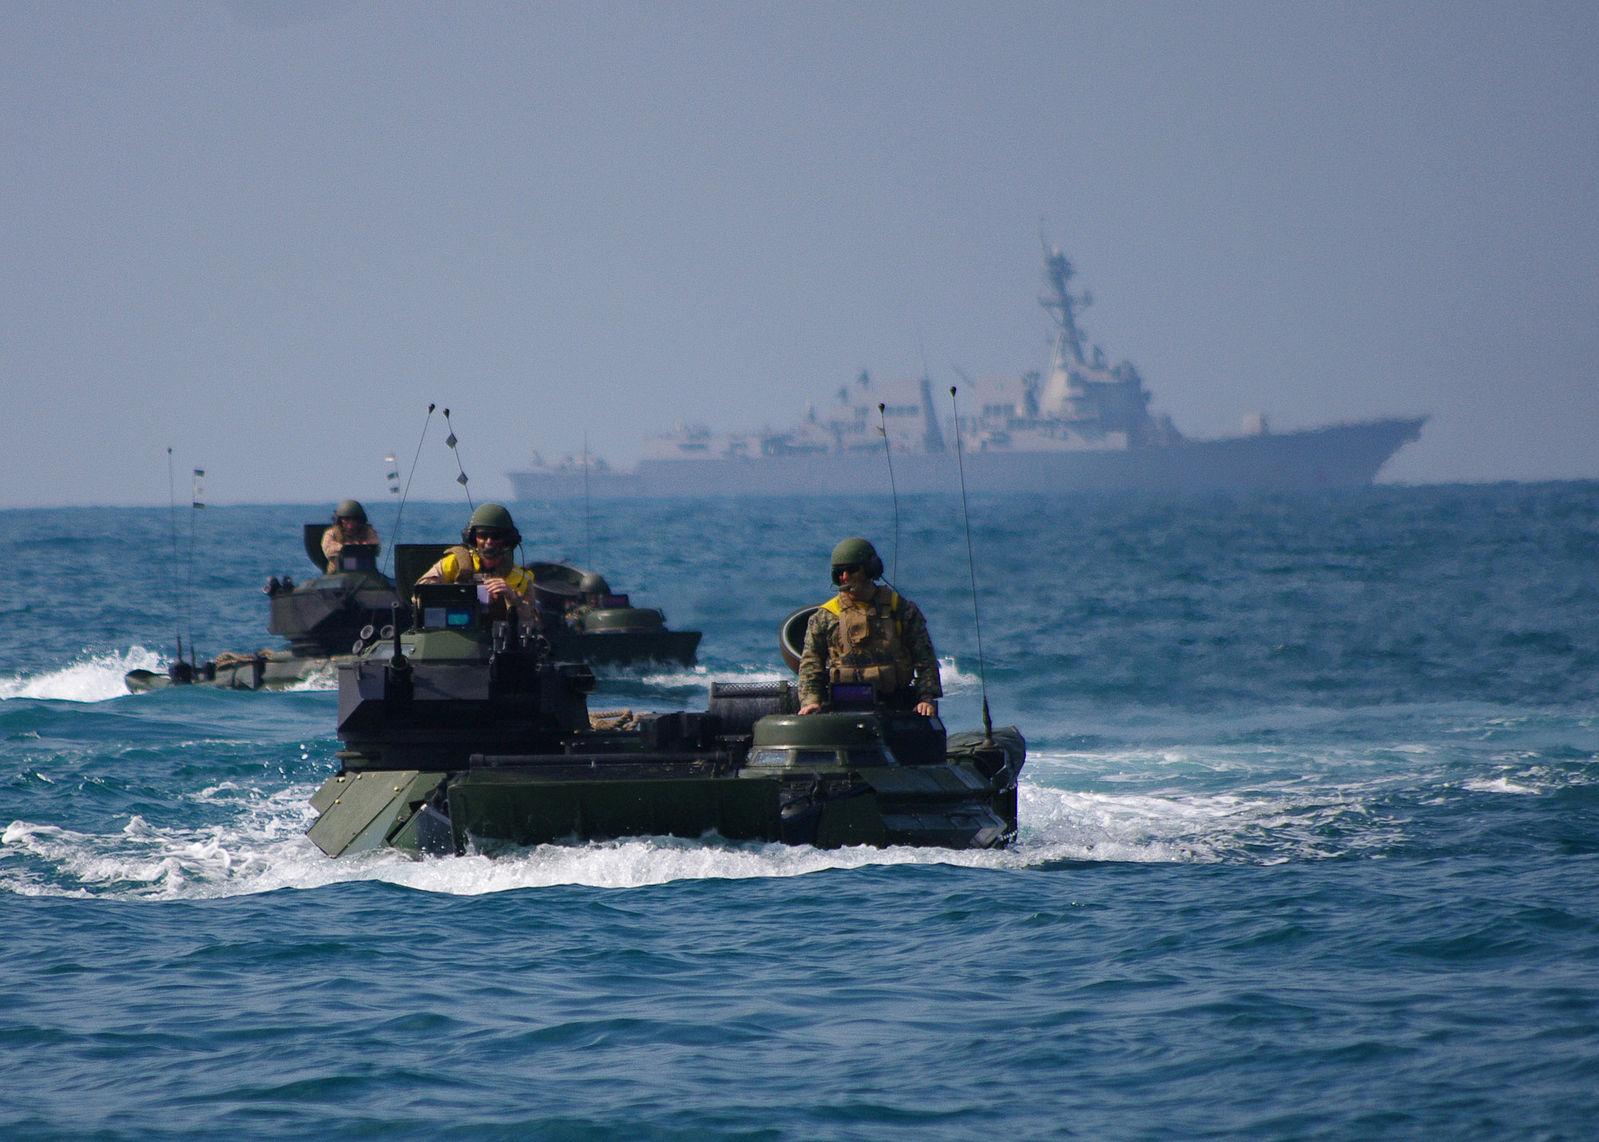 China's push into the South China Sea